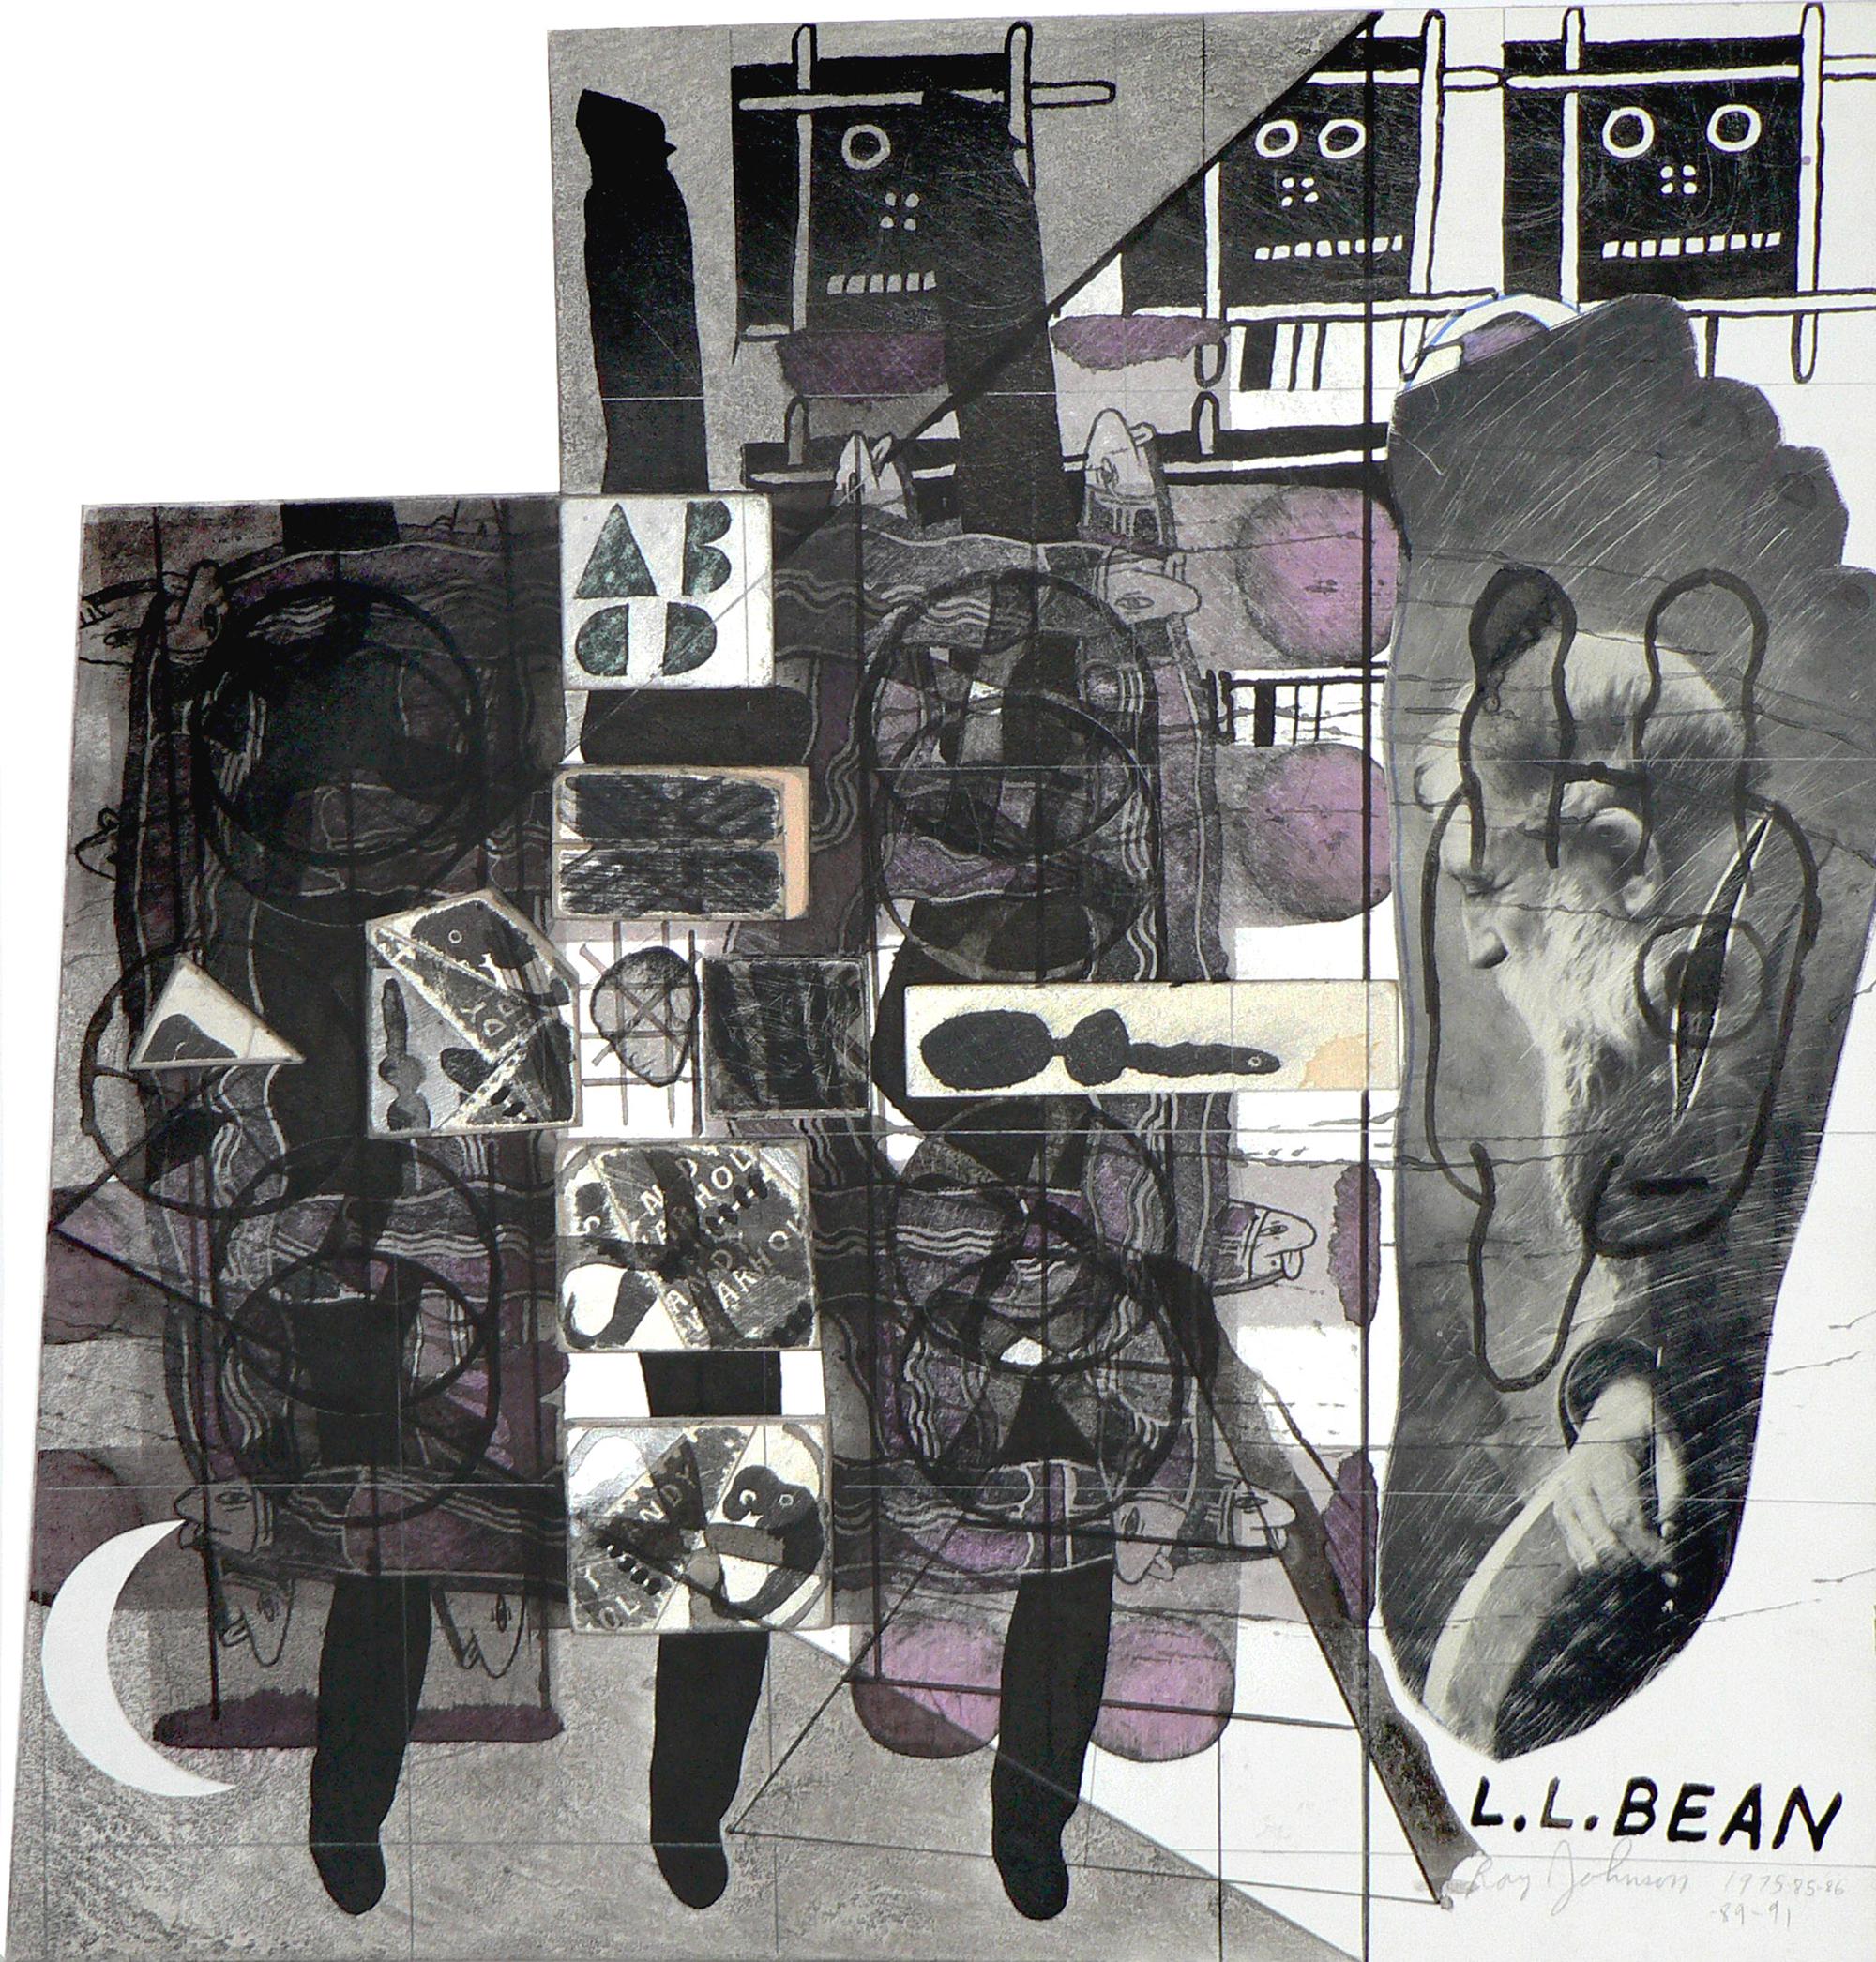 Ray Johnson Untitled (L.L. Bean) (Detail), 1975-1991 Collage on illustration board © Ray Johnson Estate, Courtesy Richard L. Feigen & Co.Ray Johnson